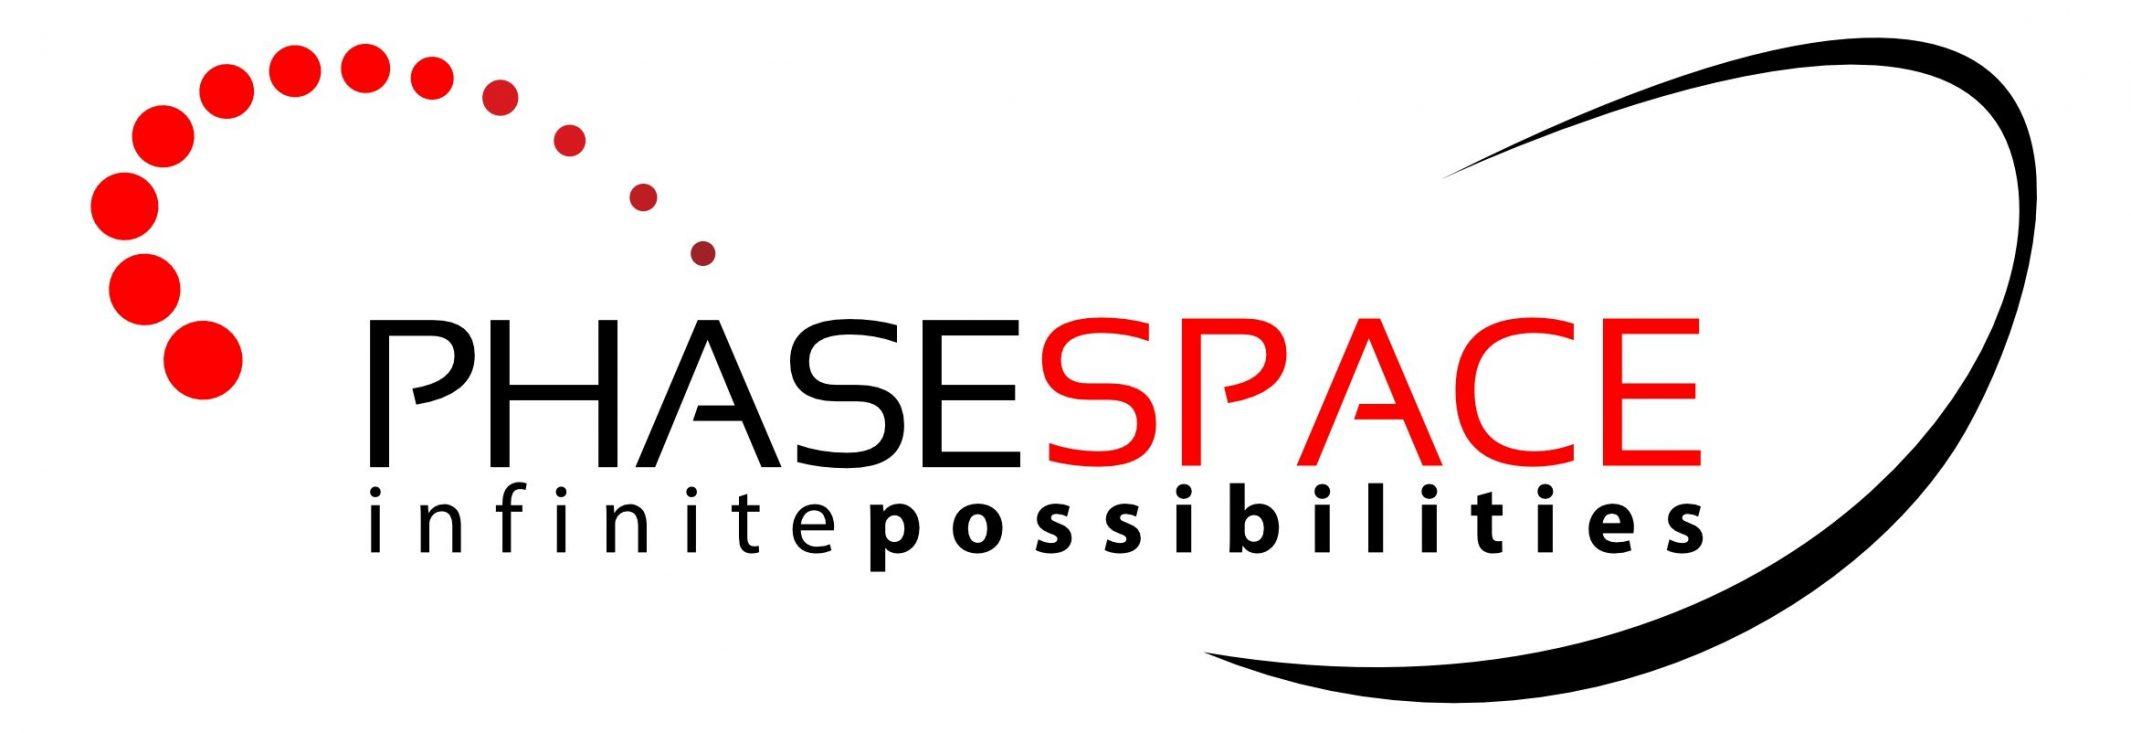 phasespace_logo